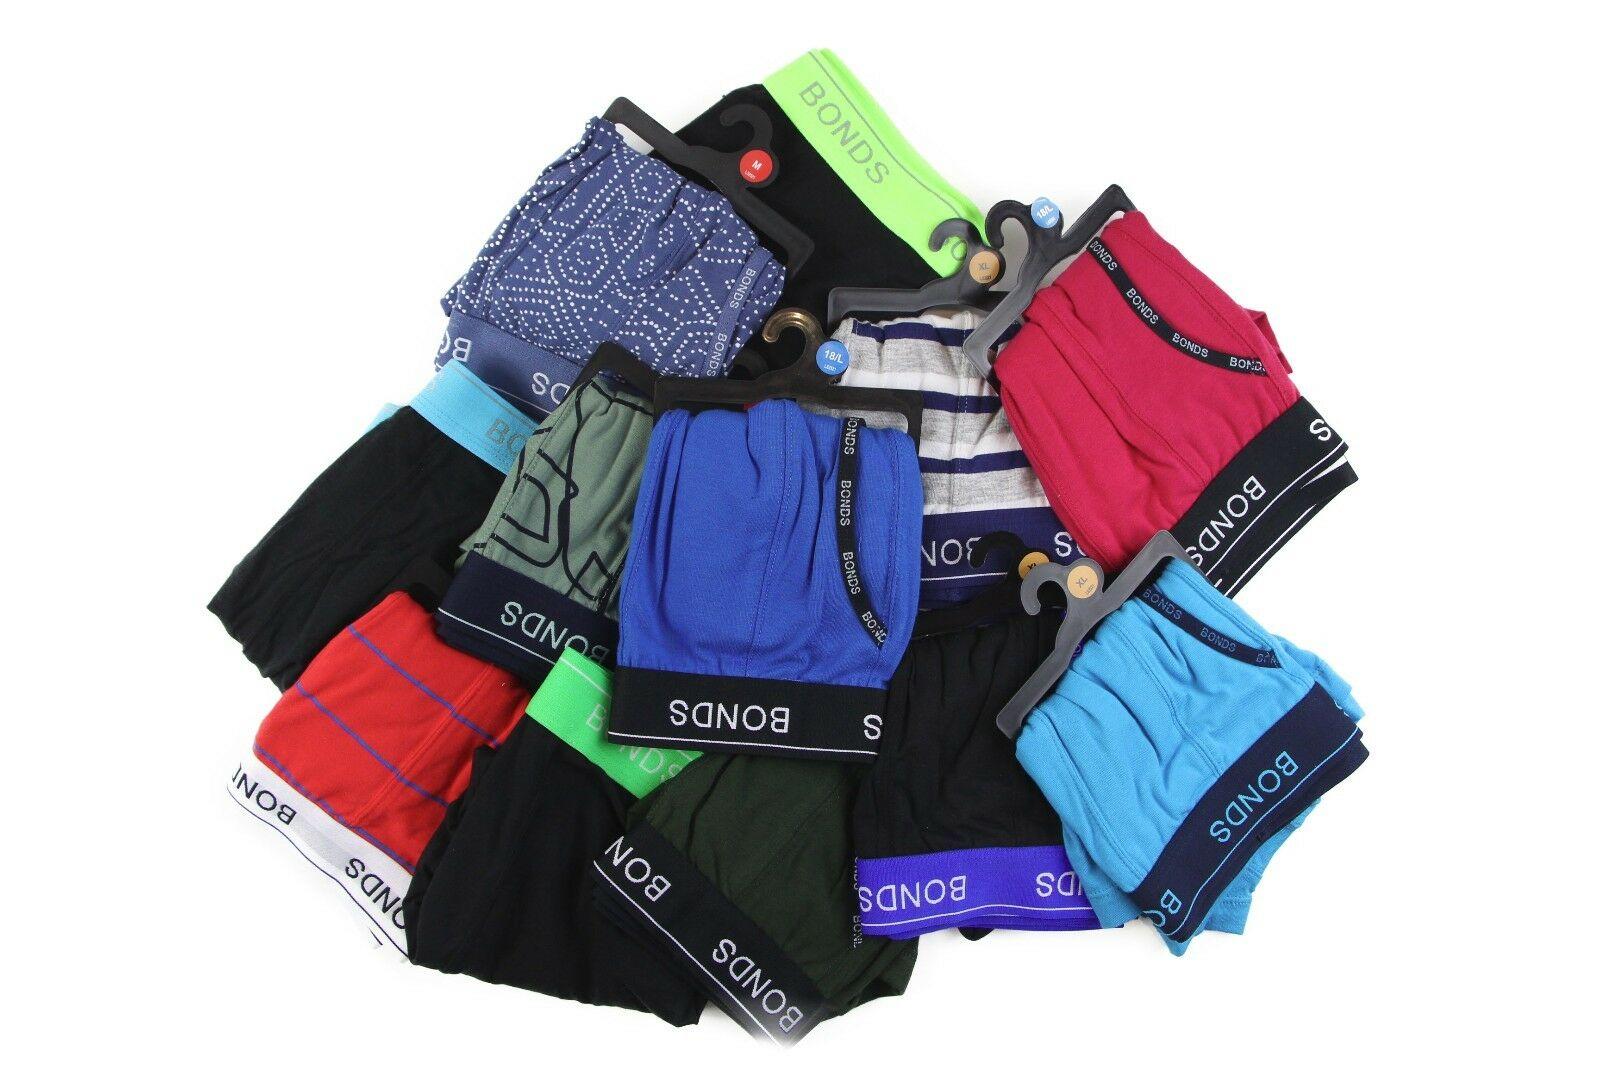 5-20-pairs-x-MENS-BONDS-UNDERWEAR-Guyfront-Trunks-Briefs-Boxer-Shorts-Size-S-XXL thumbnail 12